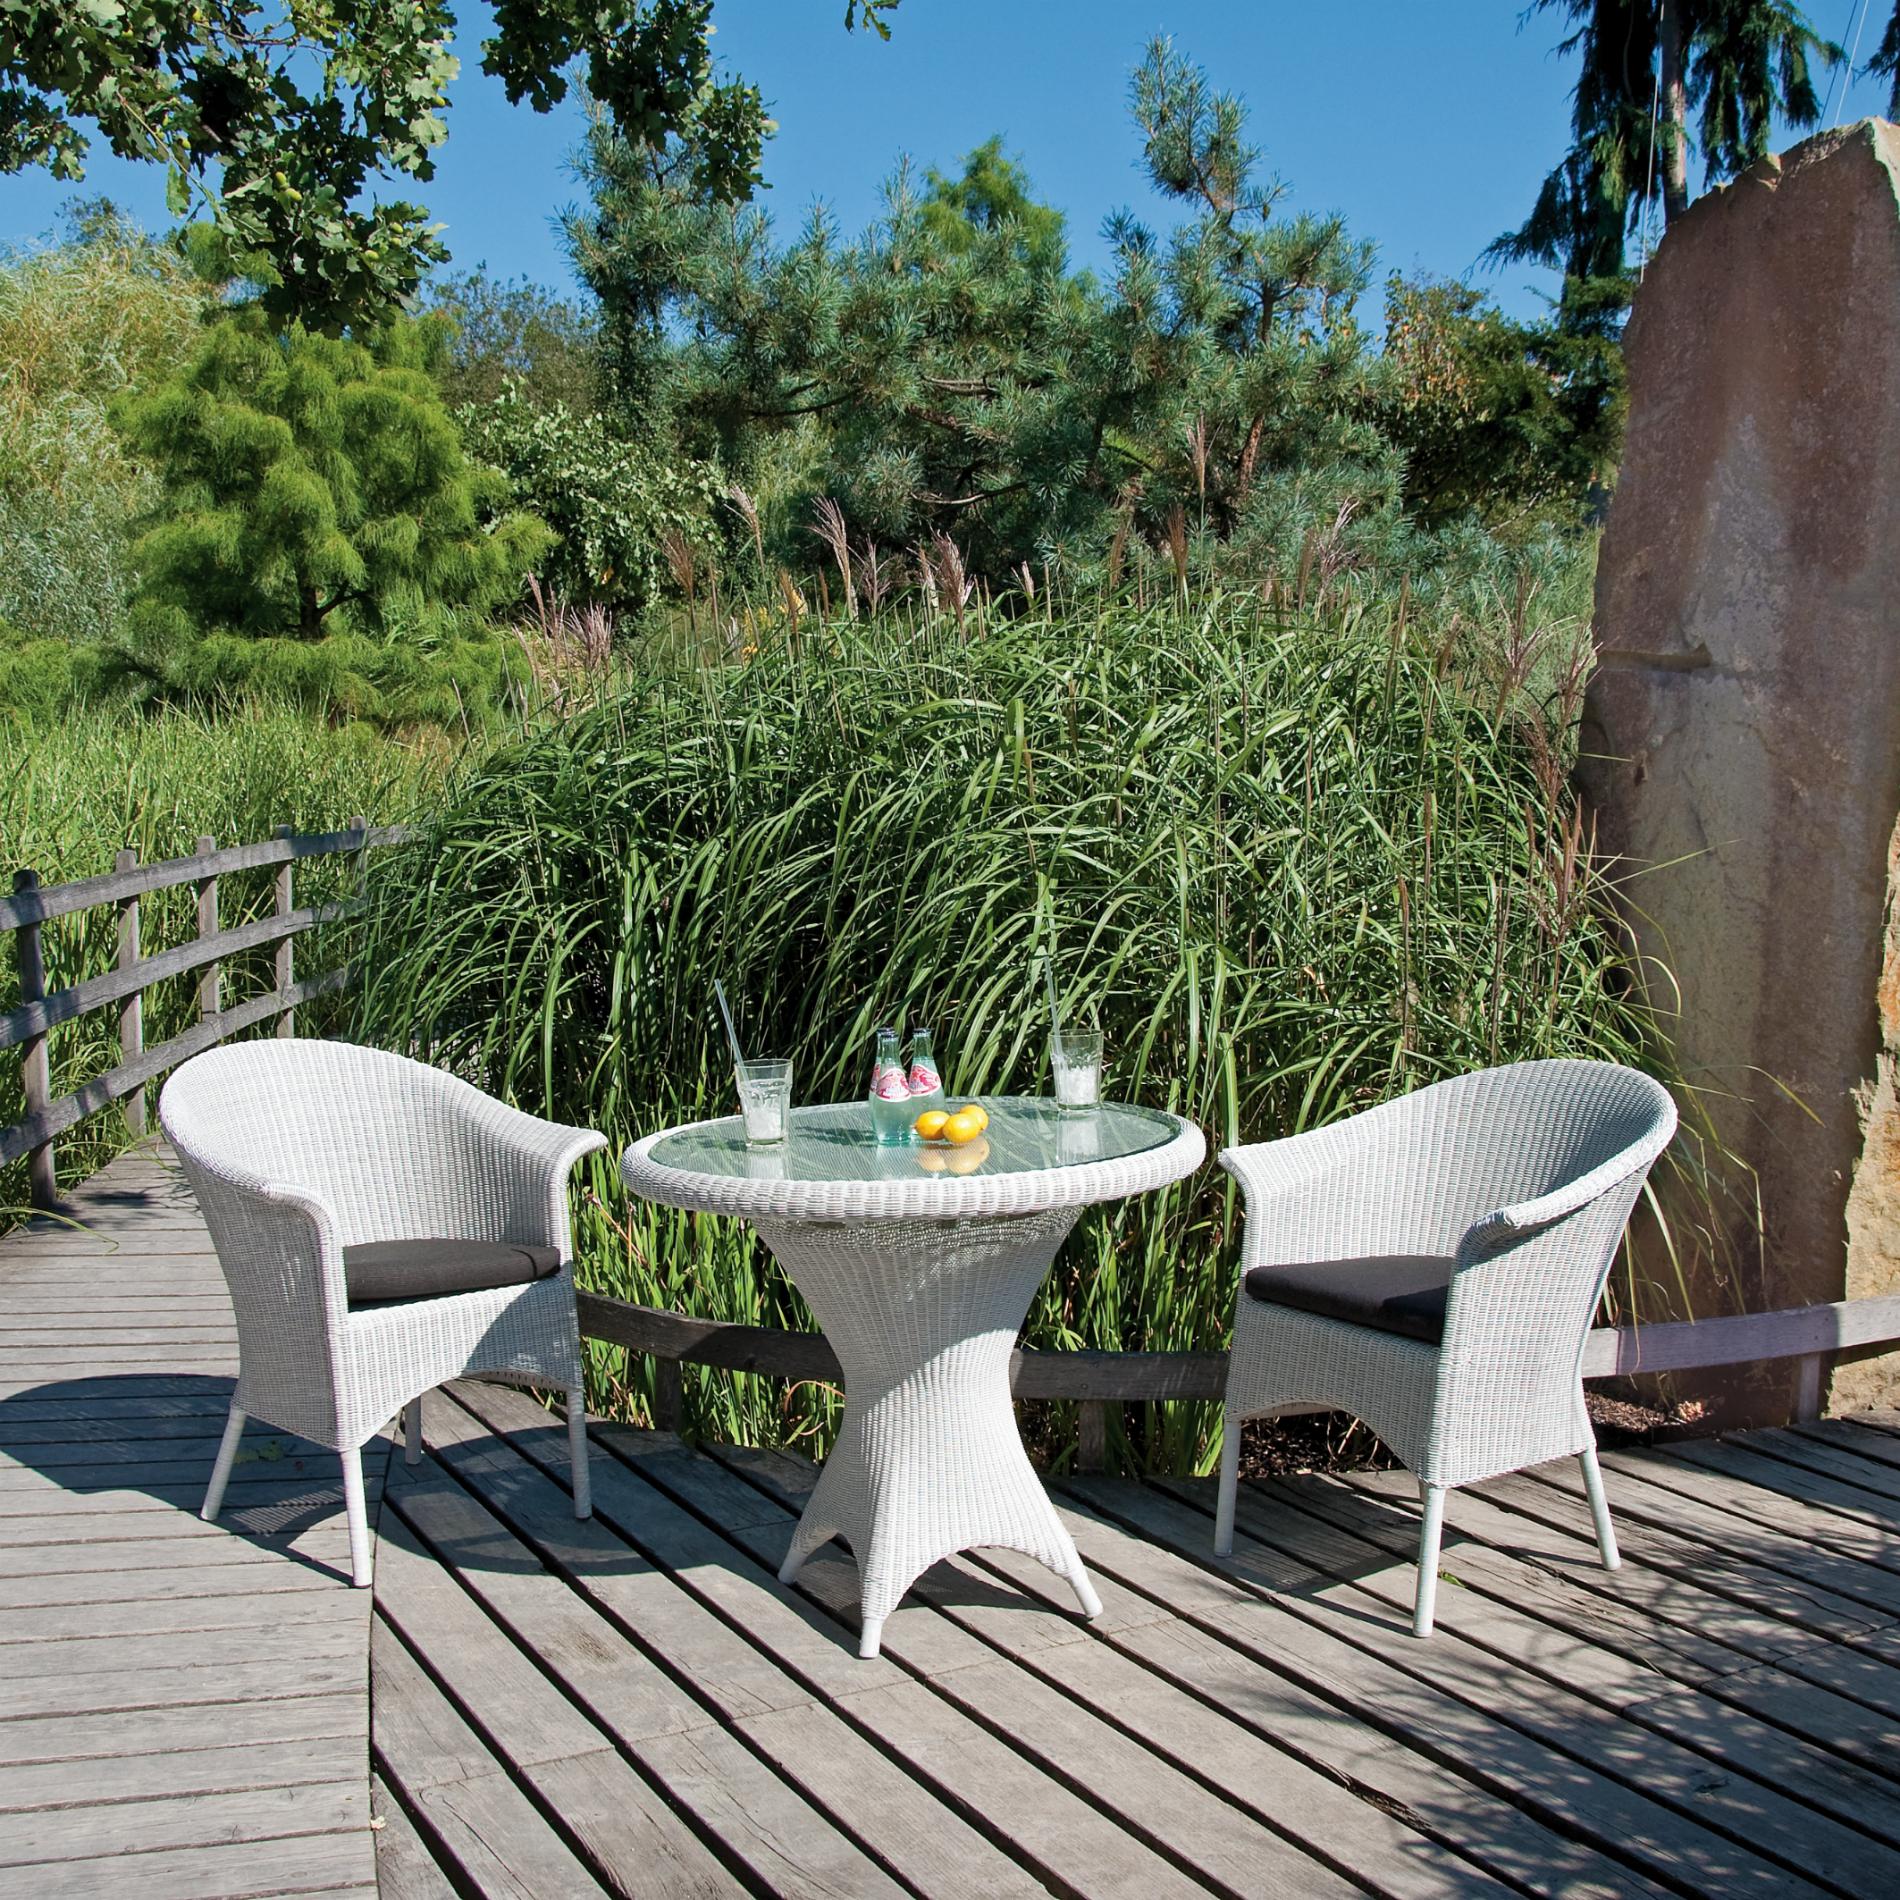 sonnenpartner cayman gartenstuhl. Black Bedroom Furniture Sets. Home Design Ideas